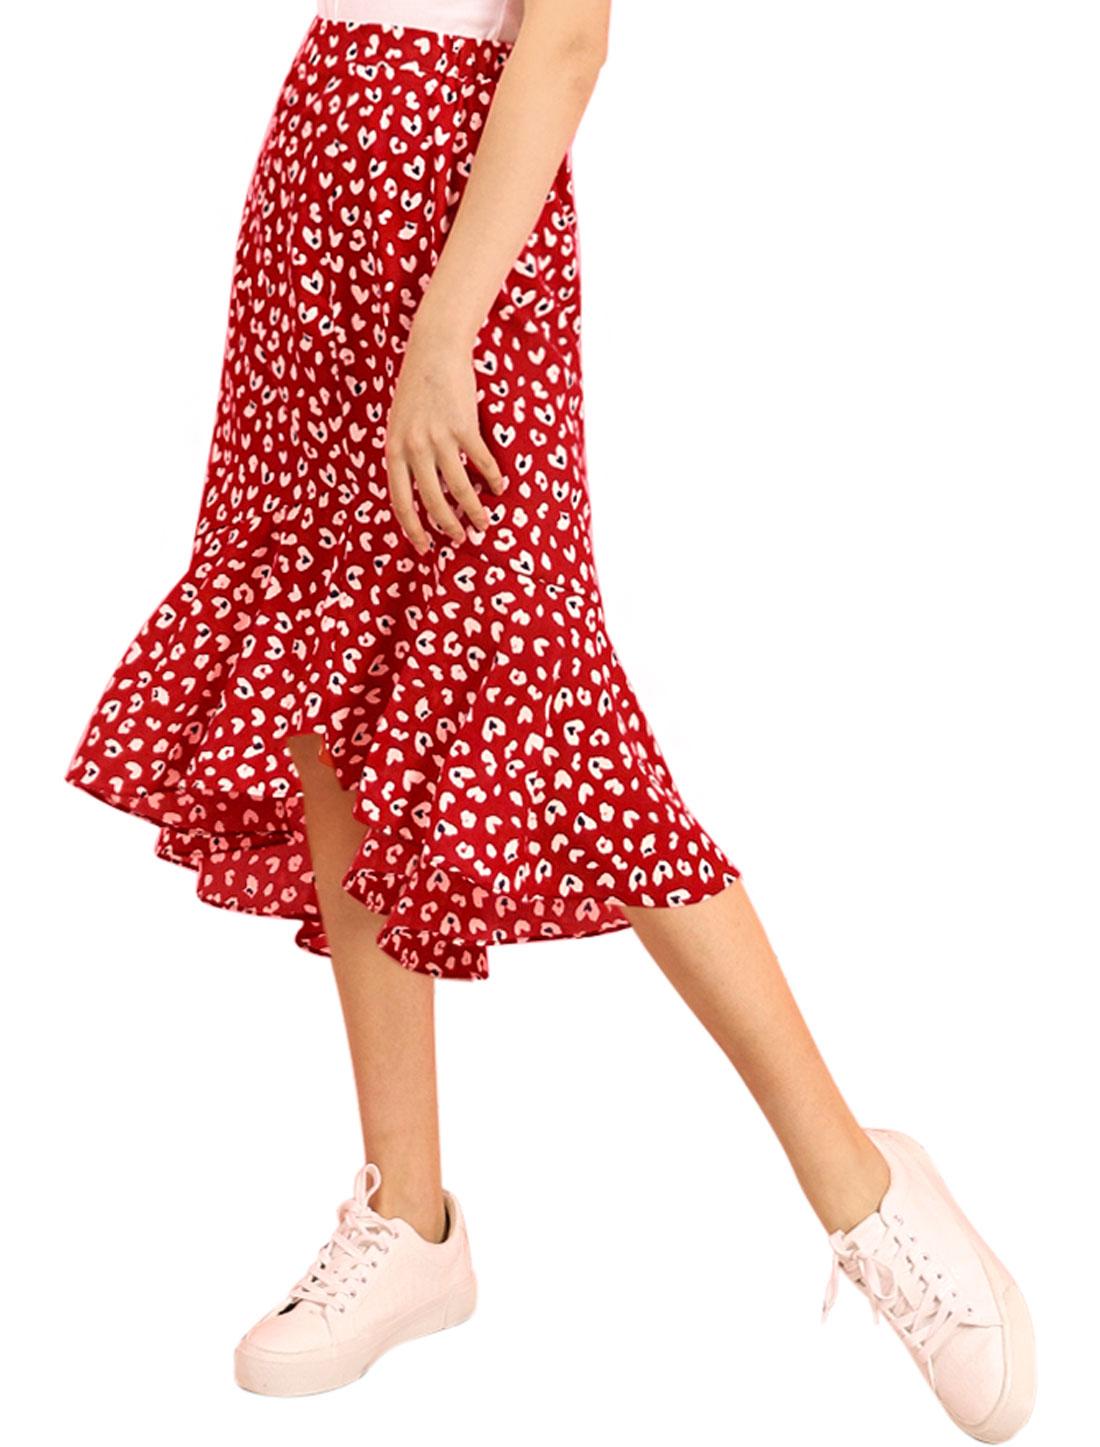 Allegra K Women's Floral Leopard Print Ruffle Midi Skirt Red XS